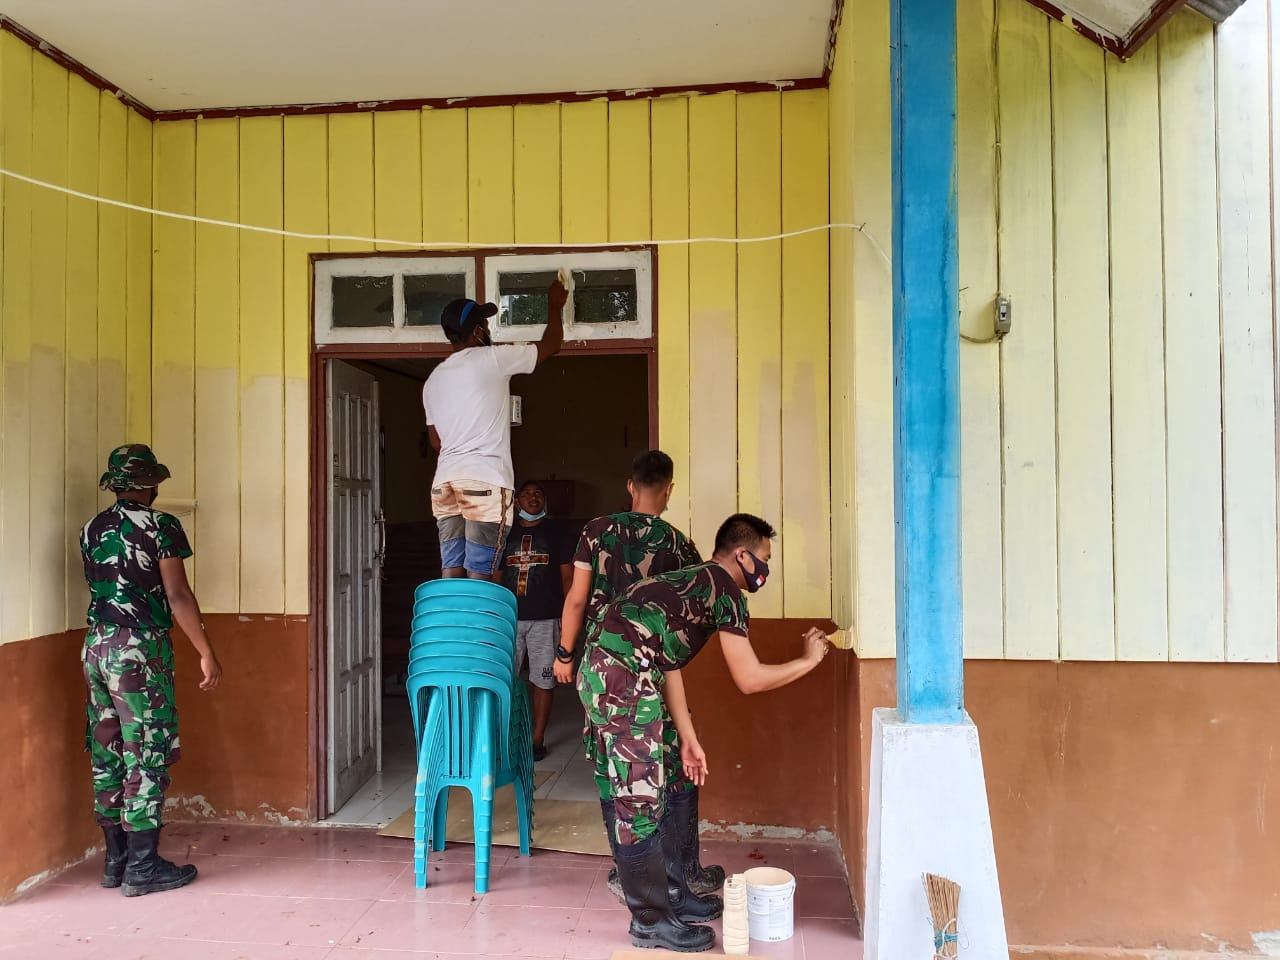 Berikan Rasa Nyaman Saat Beribadah, Satgas Pamrahwan Yonif 756 Renovasi Gereja Katolik Santo Stevanus Kàmpung Sempan Timur Mimika